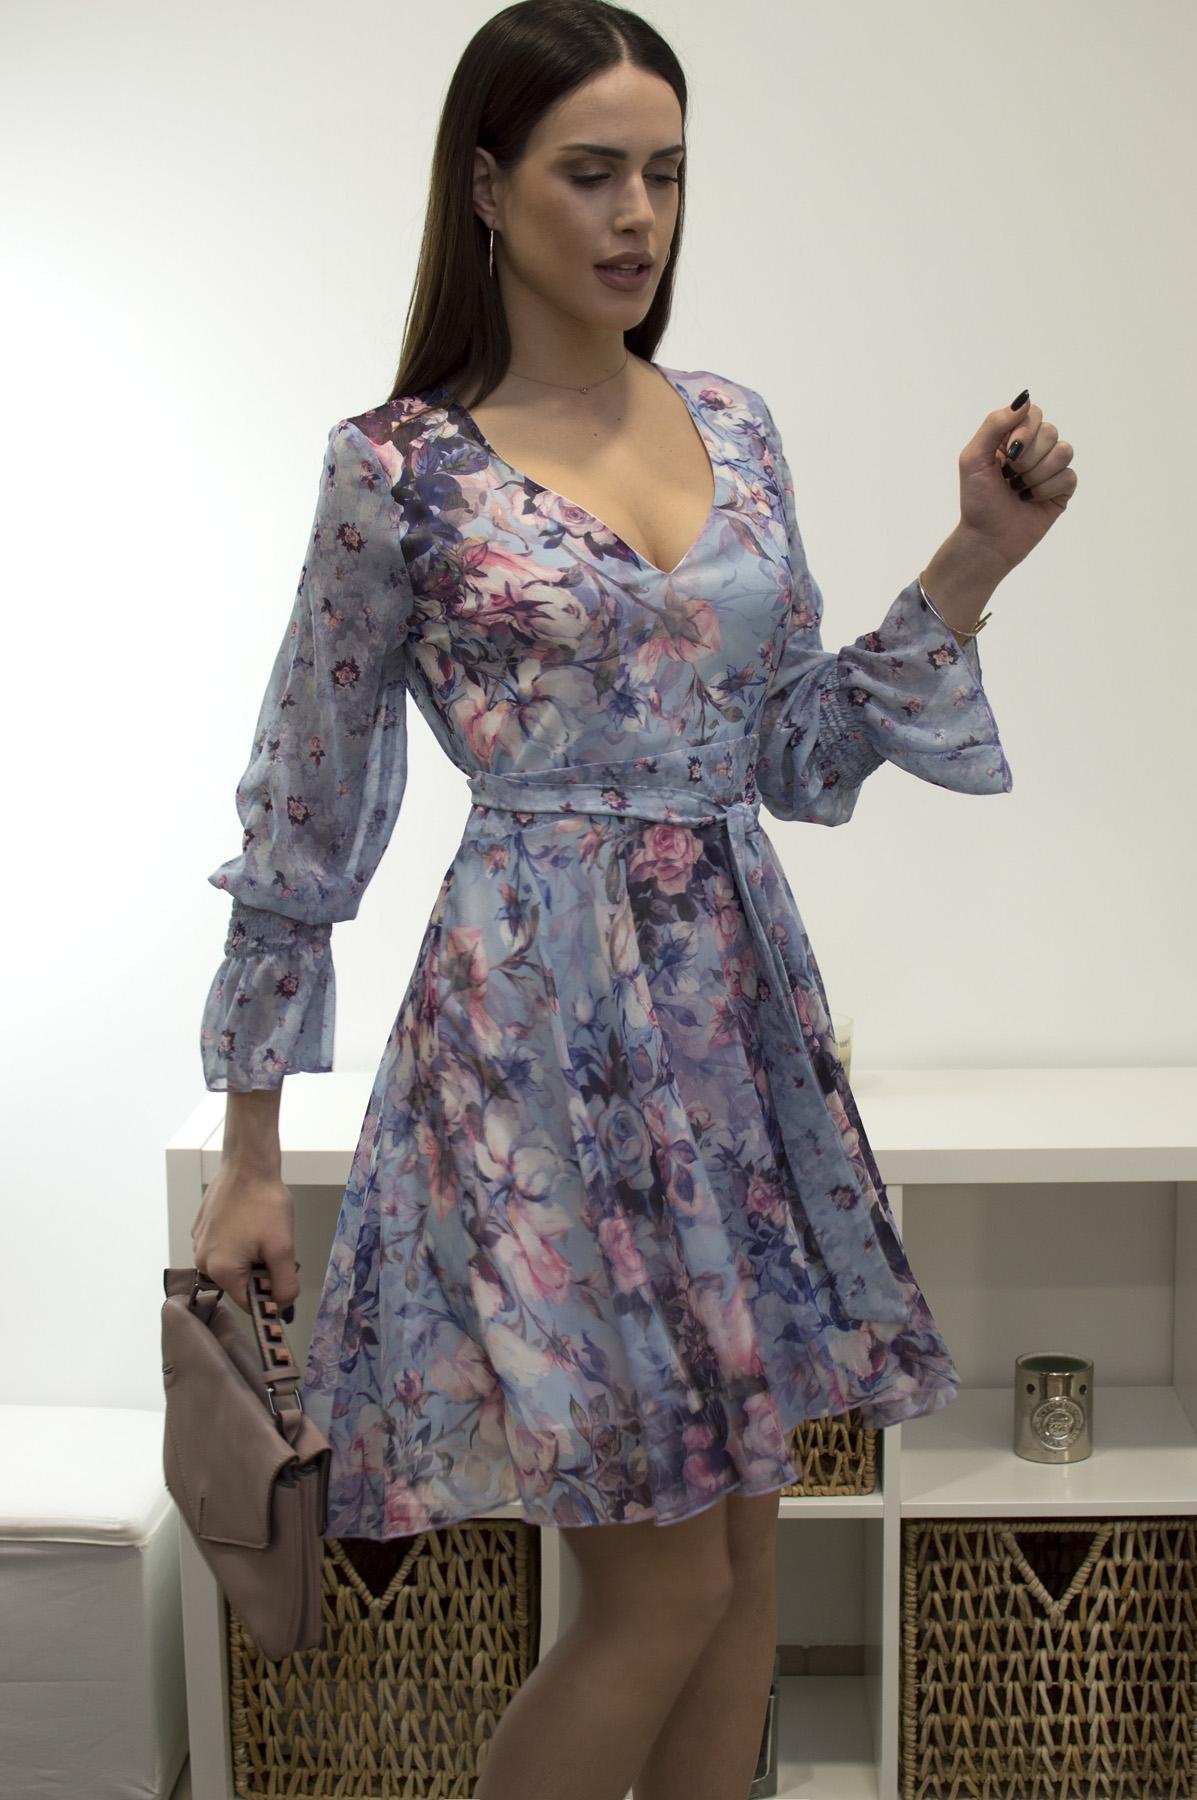 LYNNE ΦΟΡΕΜΑ ΜΙΝΙ ΚΛΟΣ - Abebablom Store 3e7043c43d9